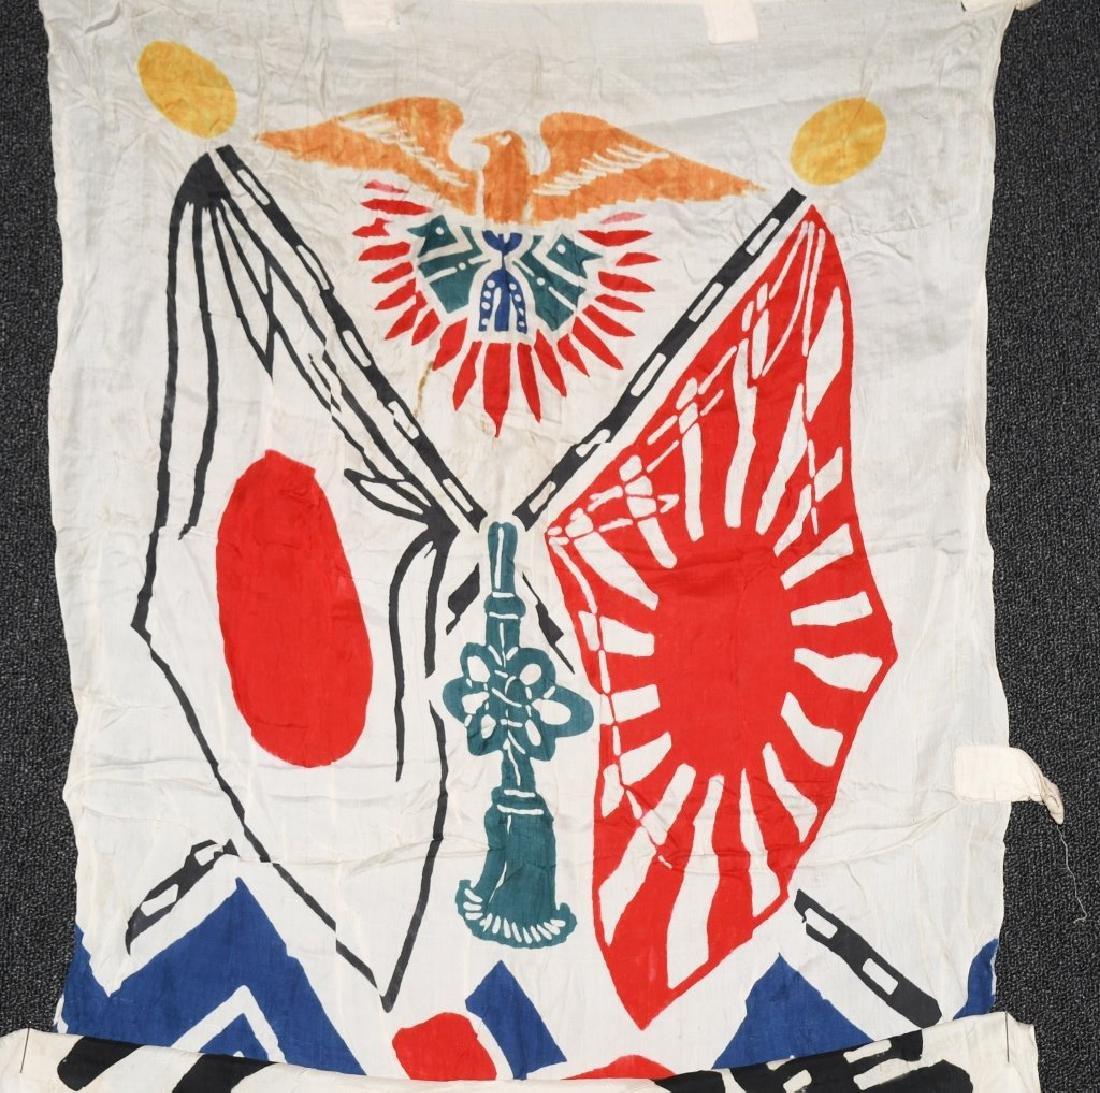 WWII JAPANESE RISING SUN BANNER - 2